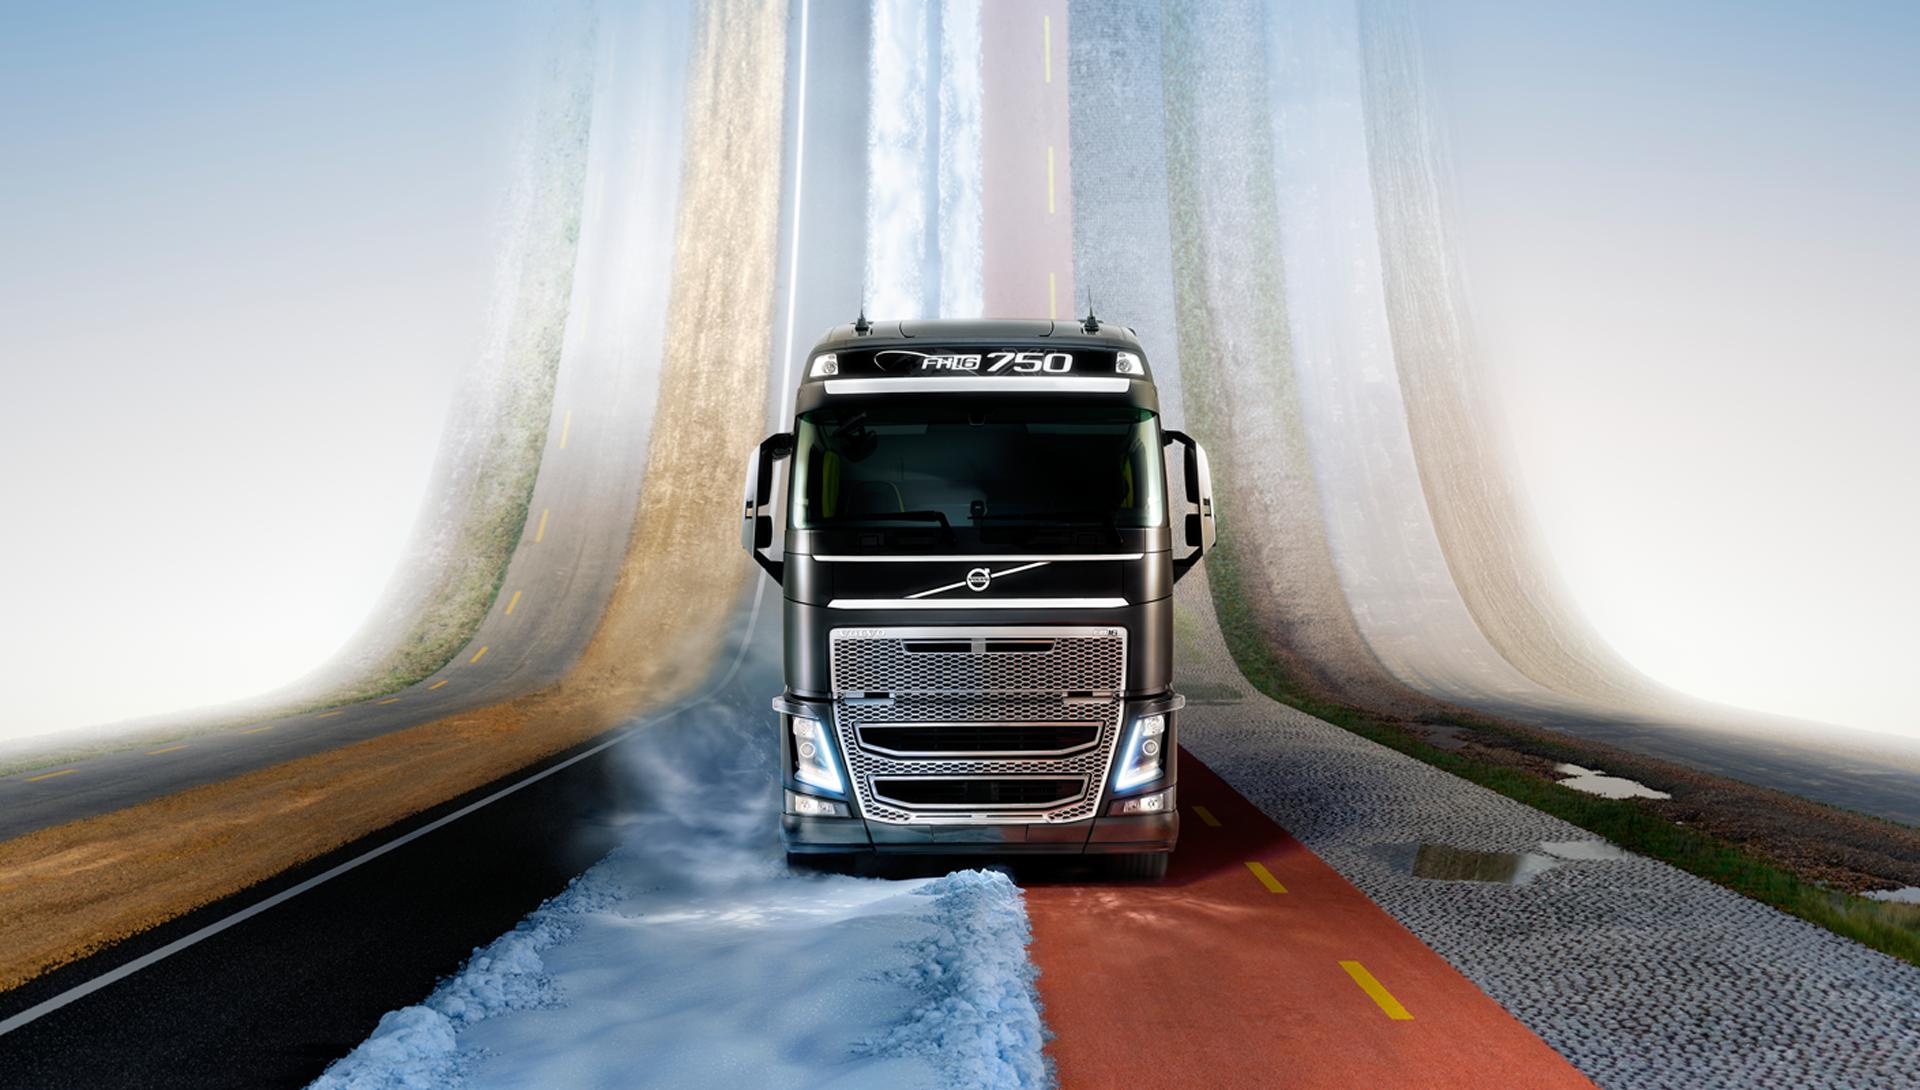 Автотранспорт бизнес план идея бизнеса услуги